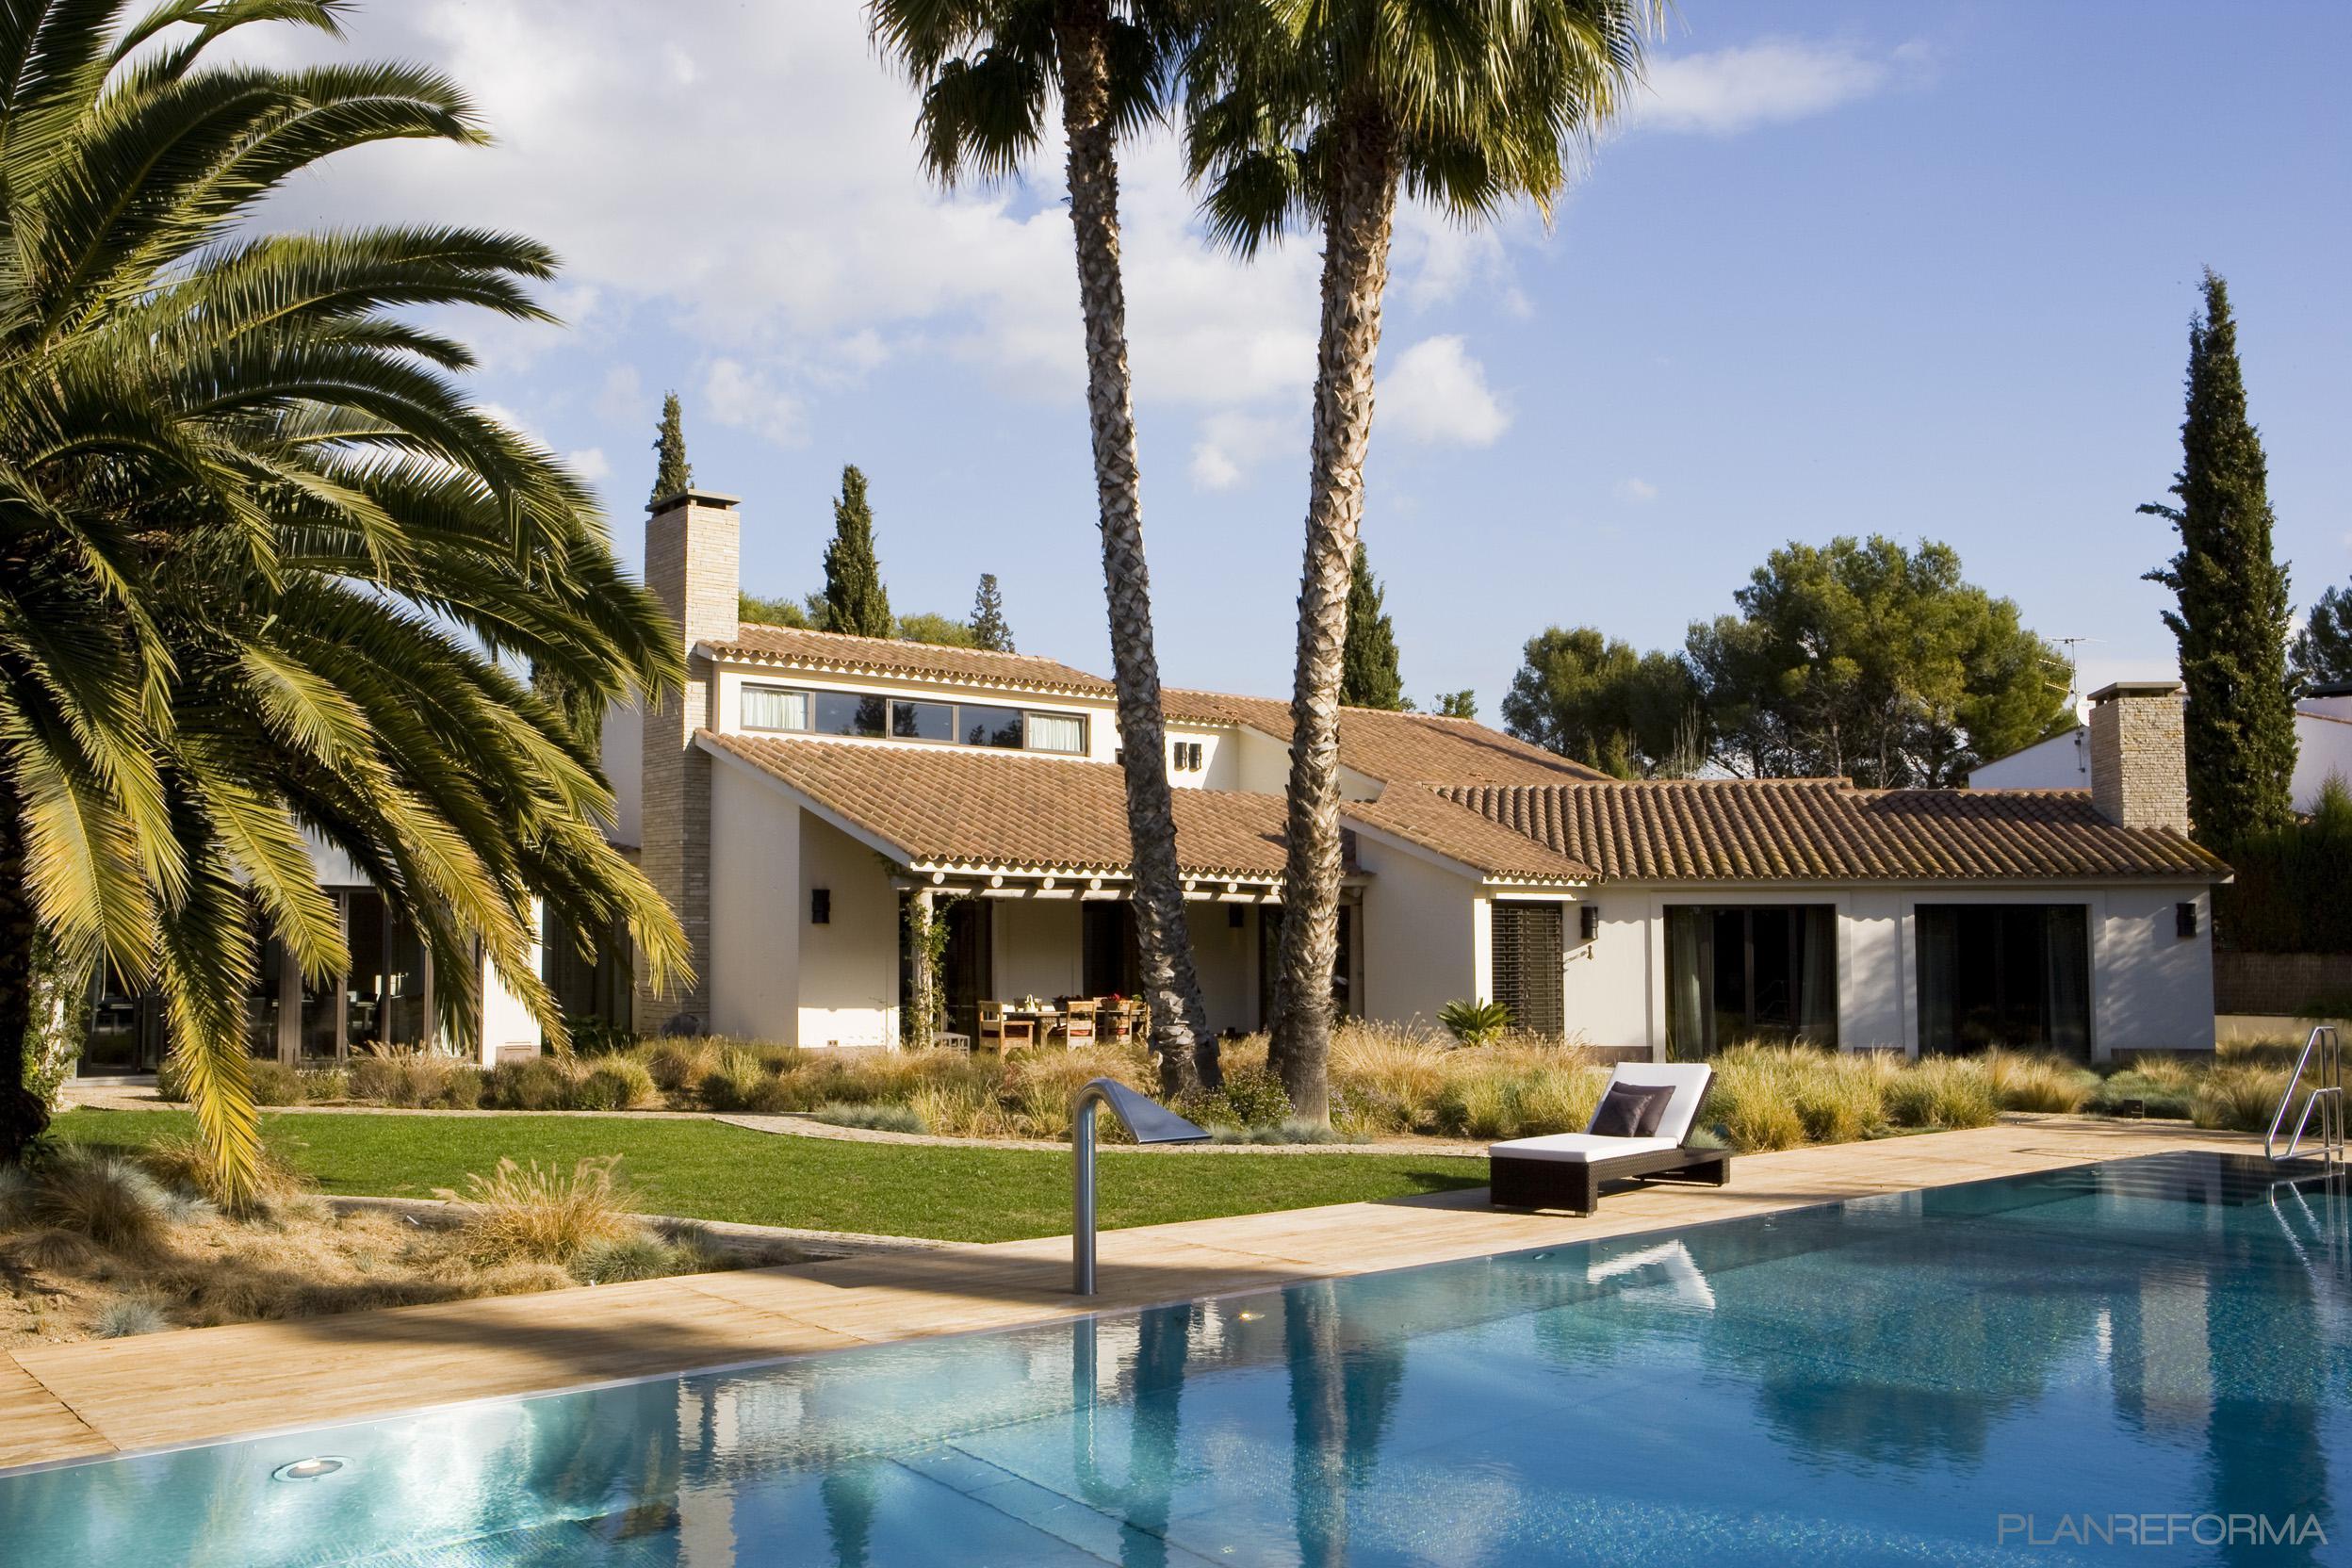 Piscina exterior jardin style contemporaneo color beige for Decoracion exterior jardin contemporaneo